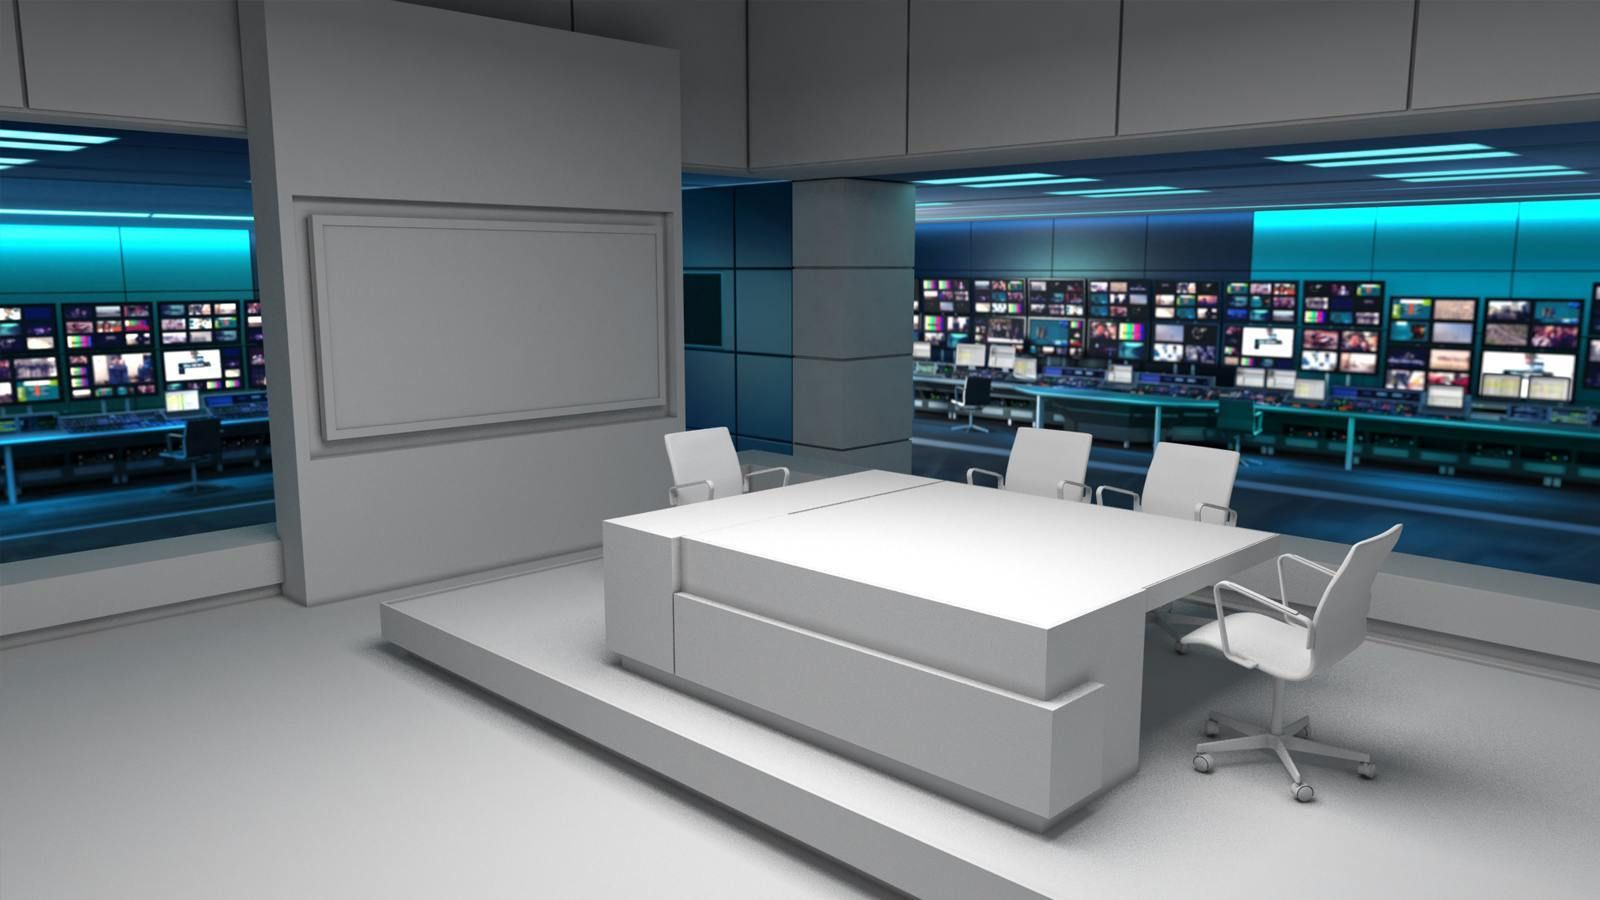 ITV News Virtual Newsroom Set Design By Lightwell